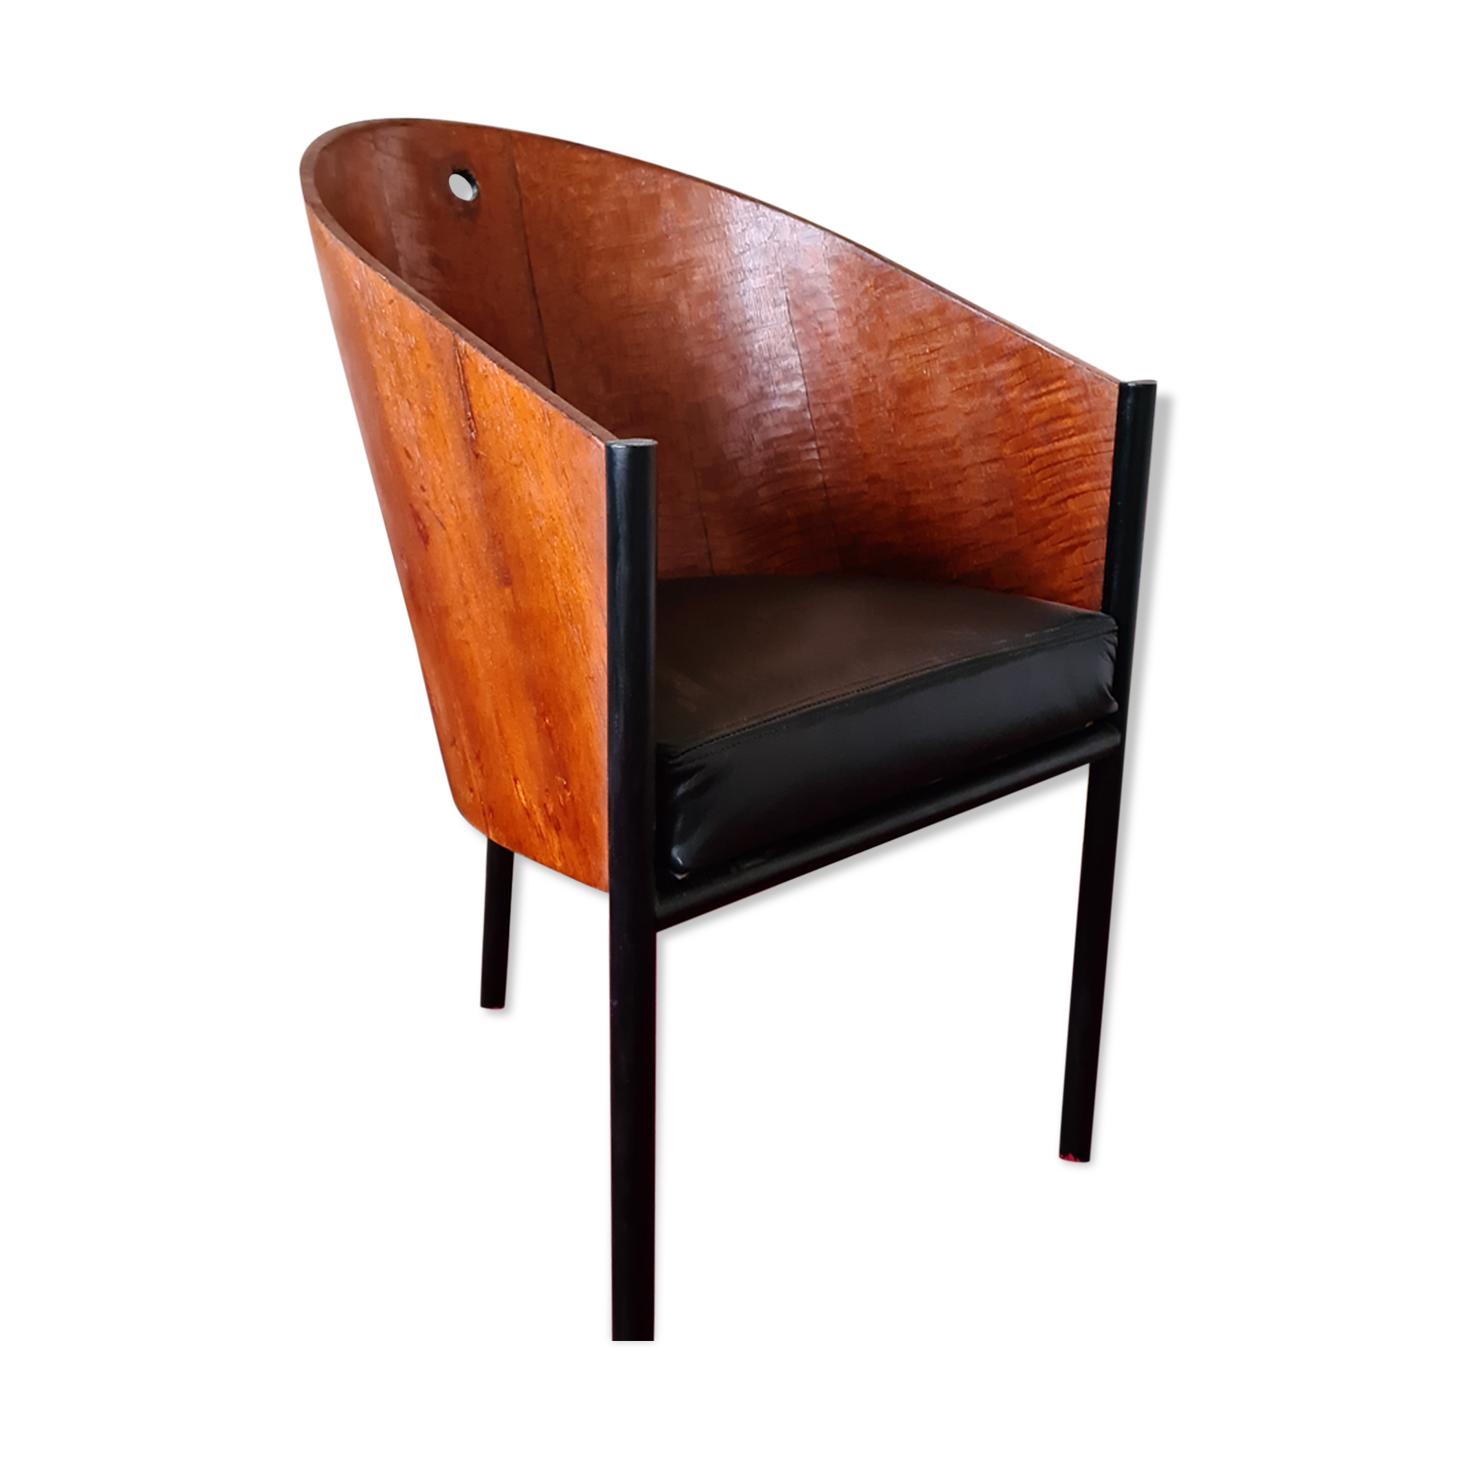 Chaise Coste par Philippe Starck pour Driade